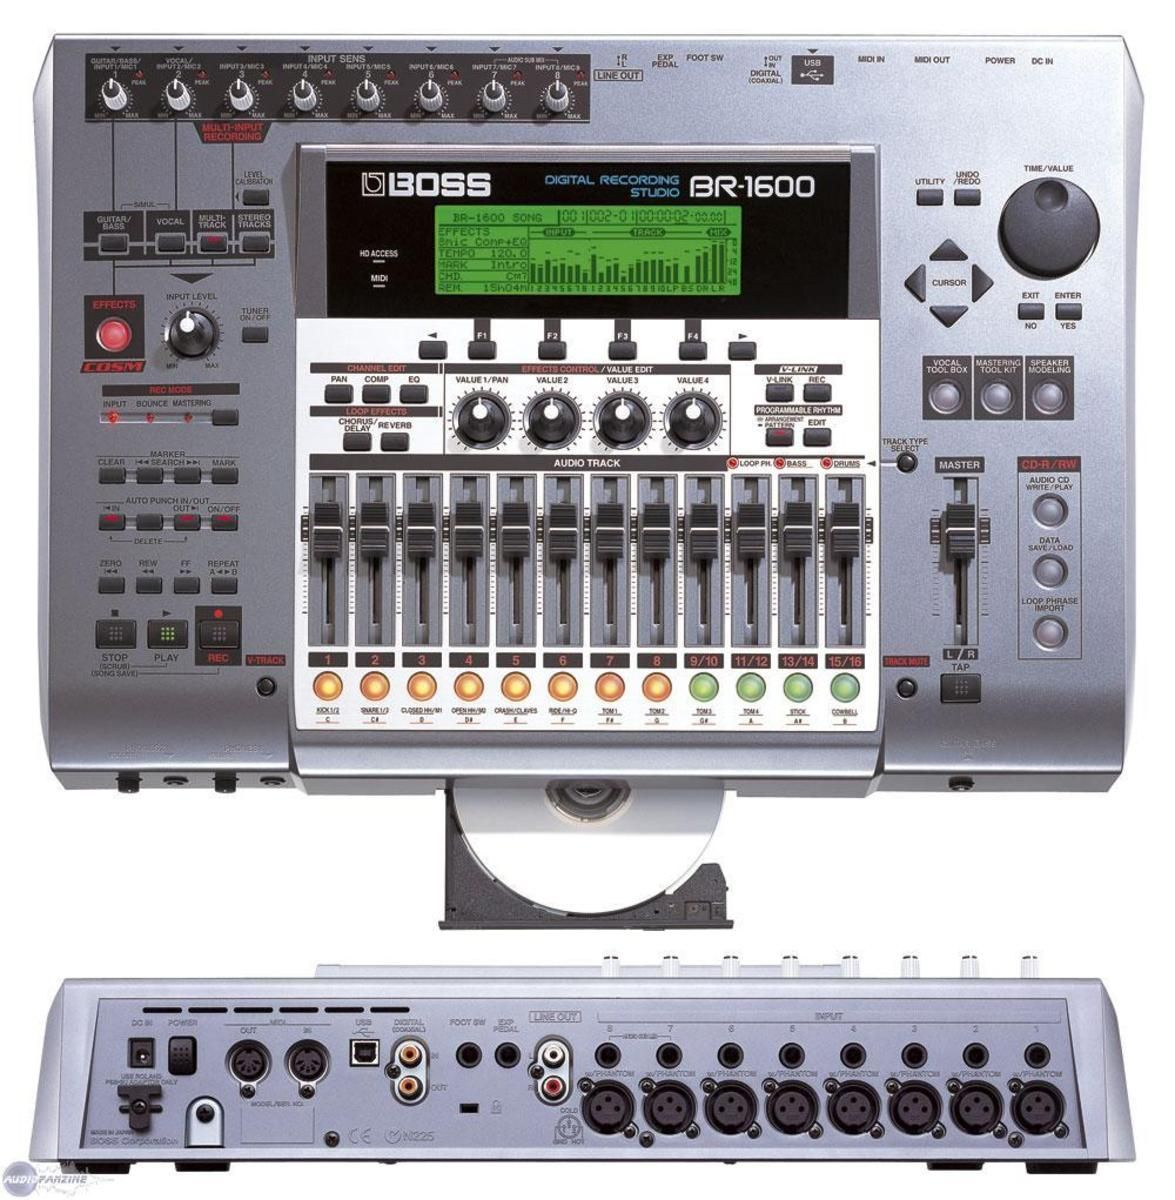 Roland MC-808 image (#417117) - Audiofanzine